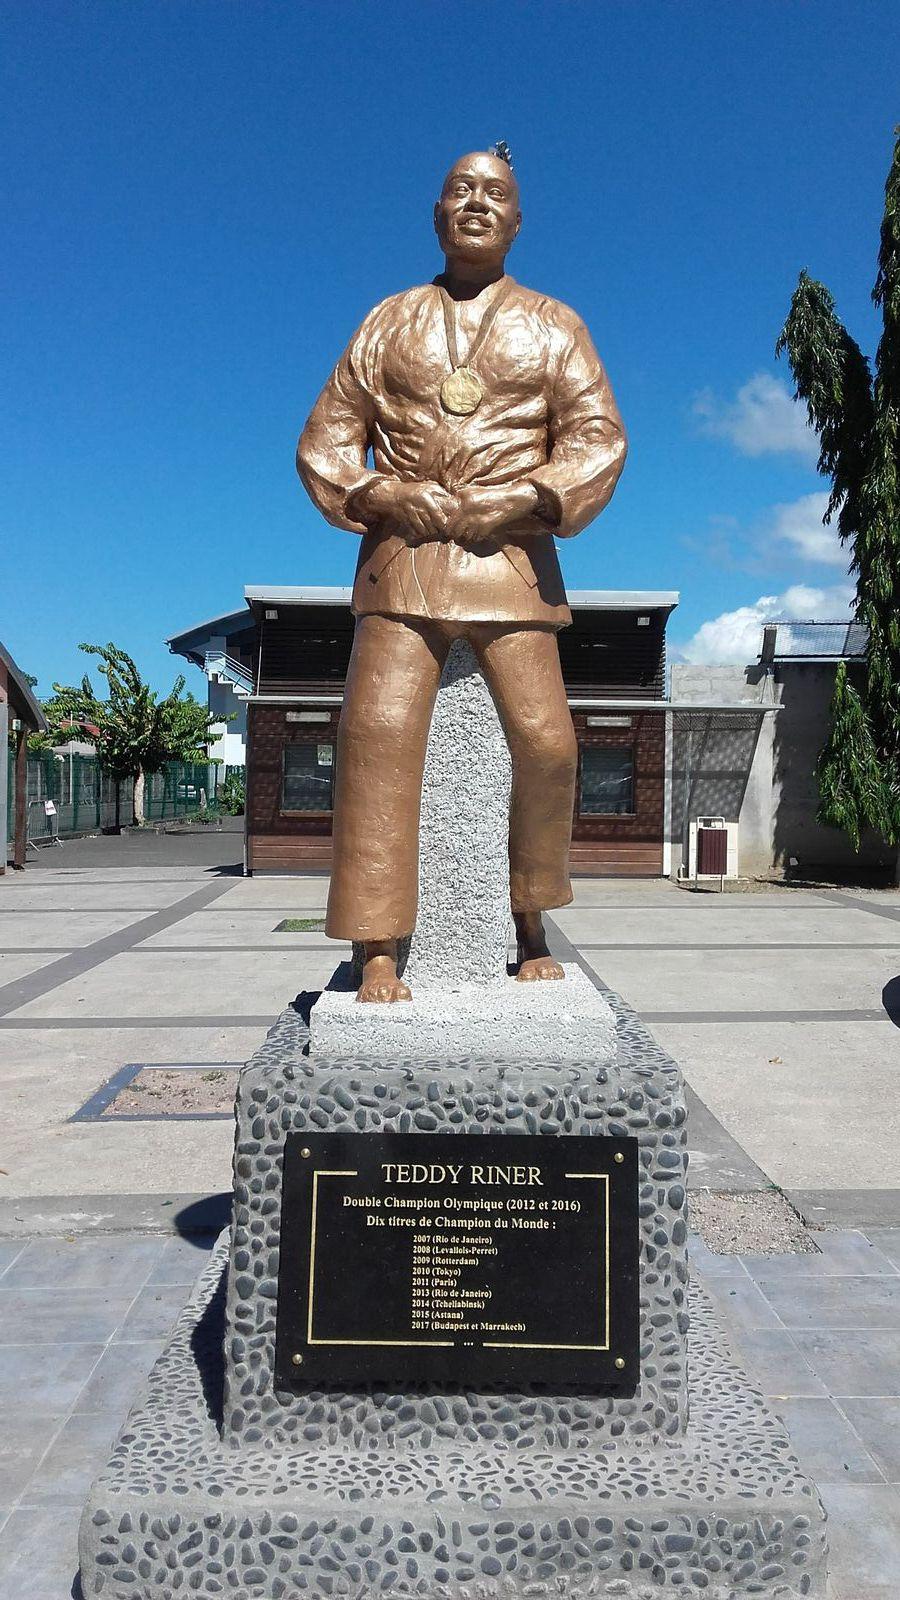 Teddy Riner, judoka, statue, champion du monde, Vieux-Habitants, Basse-Terre, Guadeloupe, Antilles,